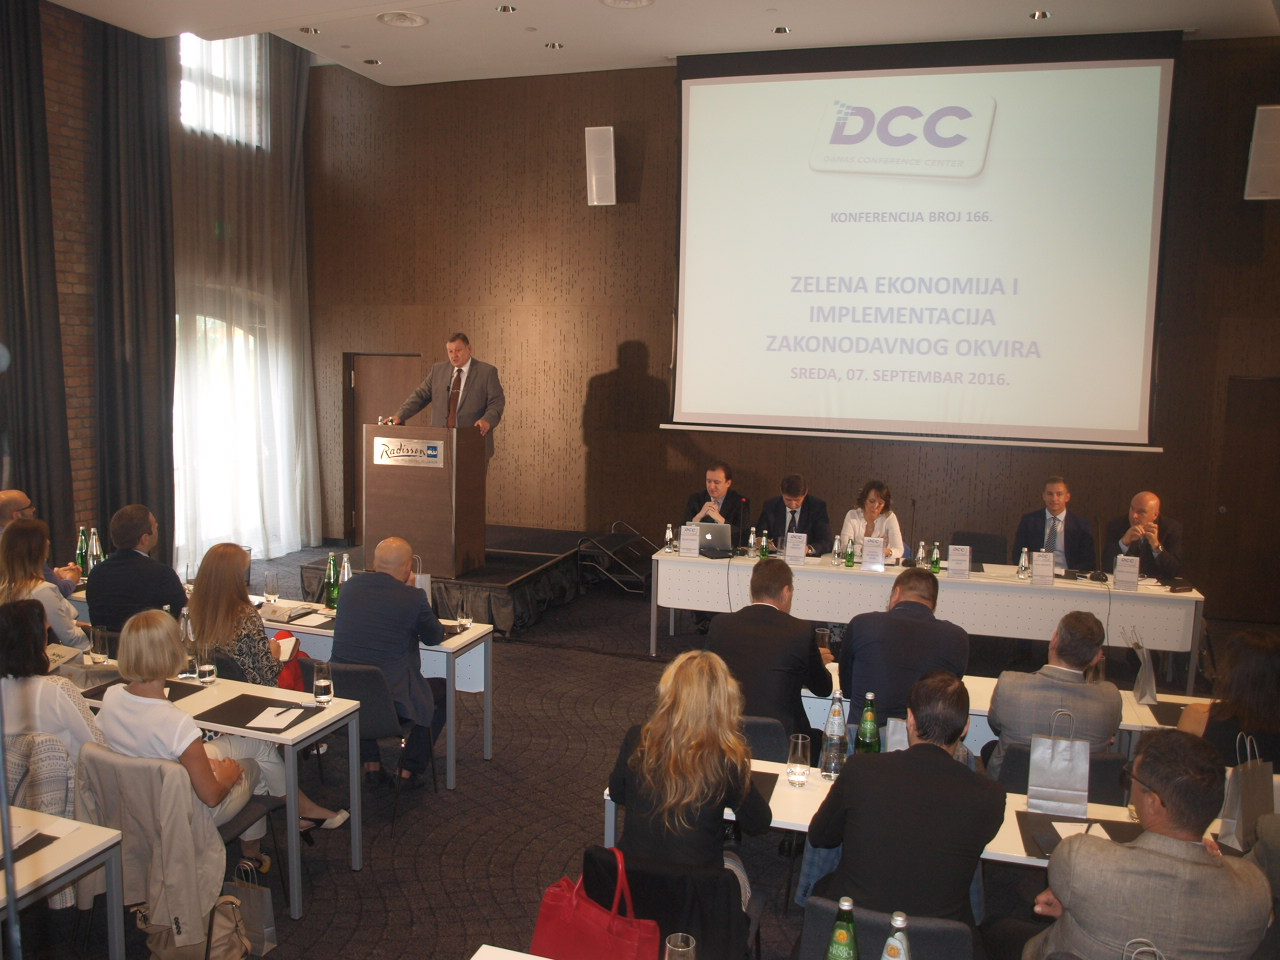 Nova sezona konferencija Danas konferens centra